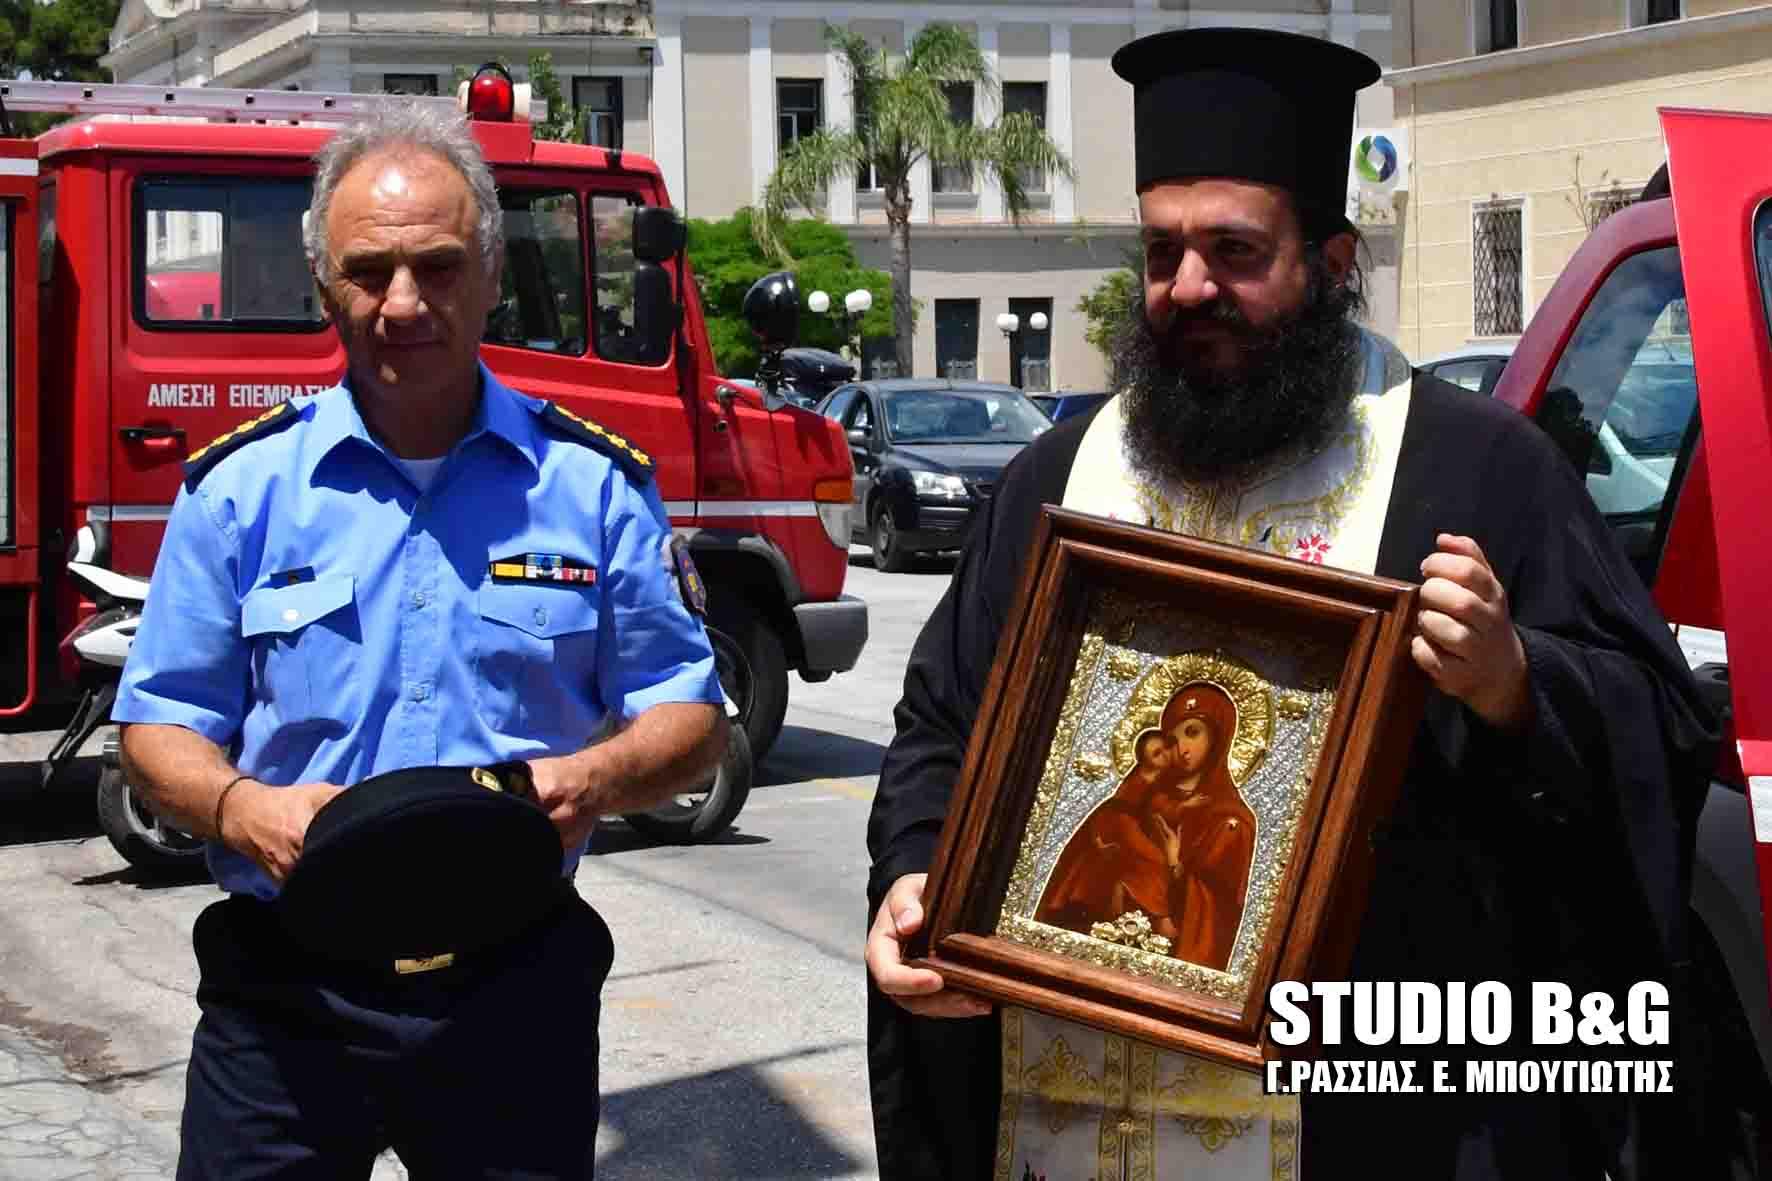 You are currently viewing Η Πυροσβεστικής υπηρεσίας Ναυπλίου υποδέχθηκε την Τιμία Εσθήτα της Παναγίας